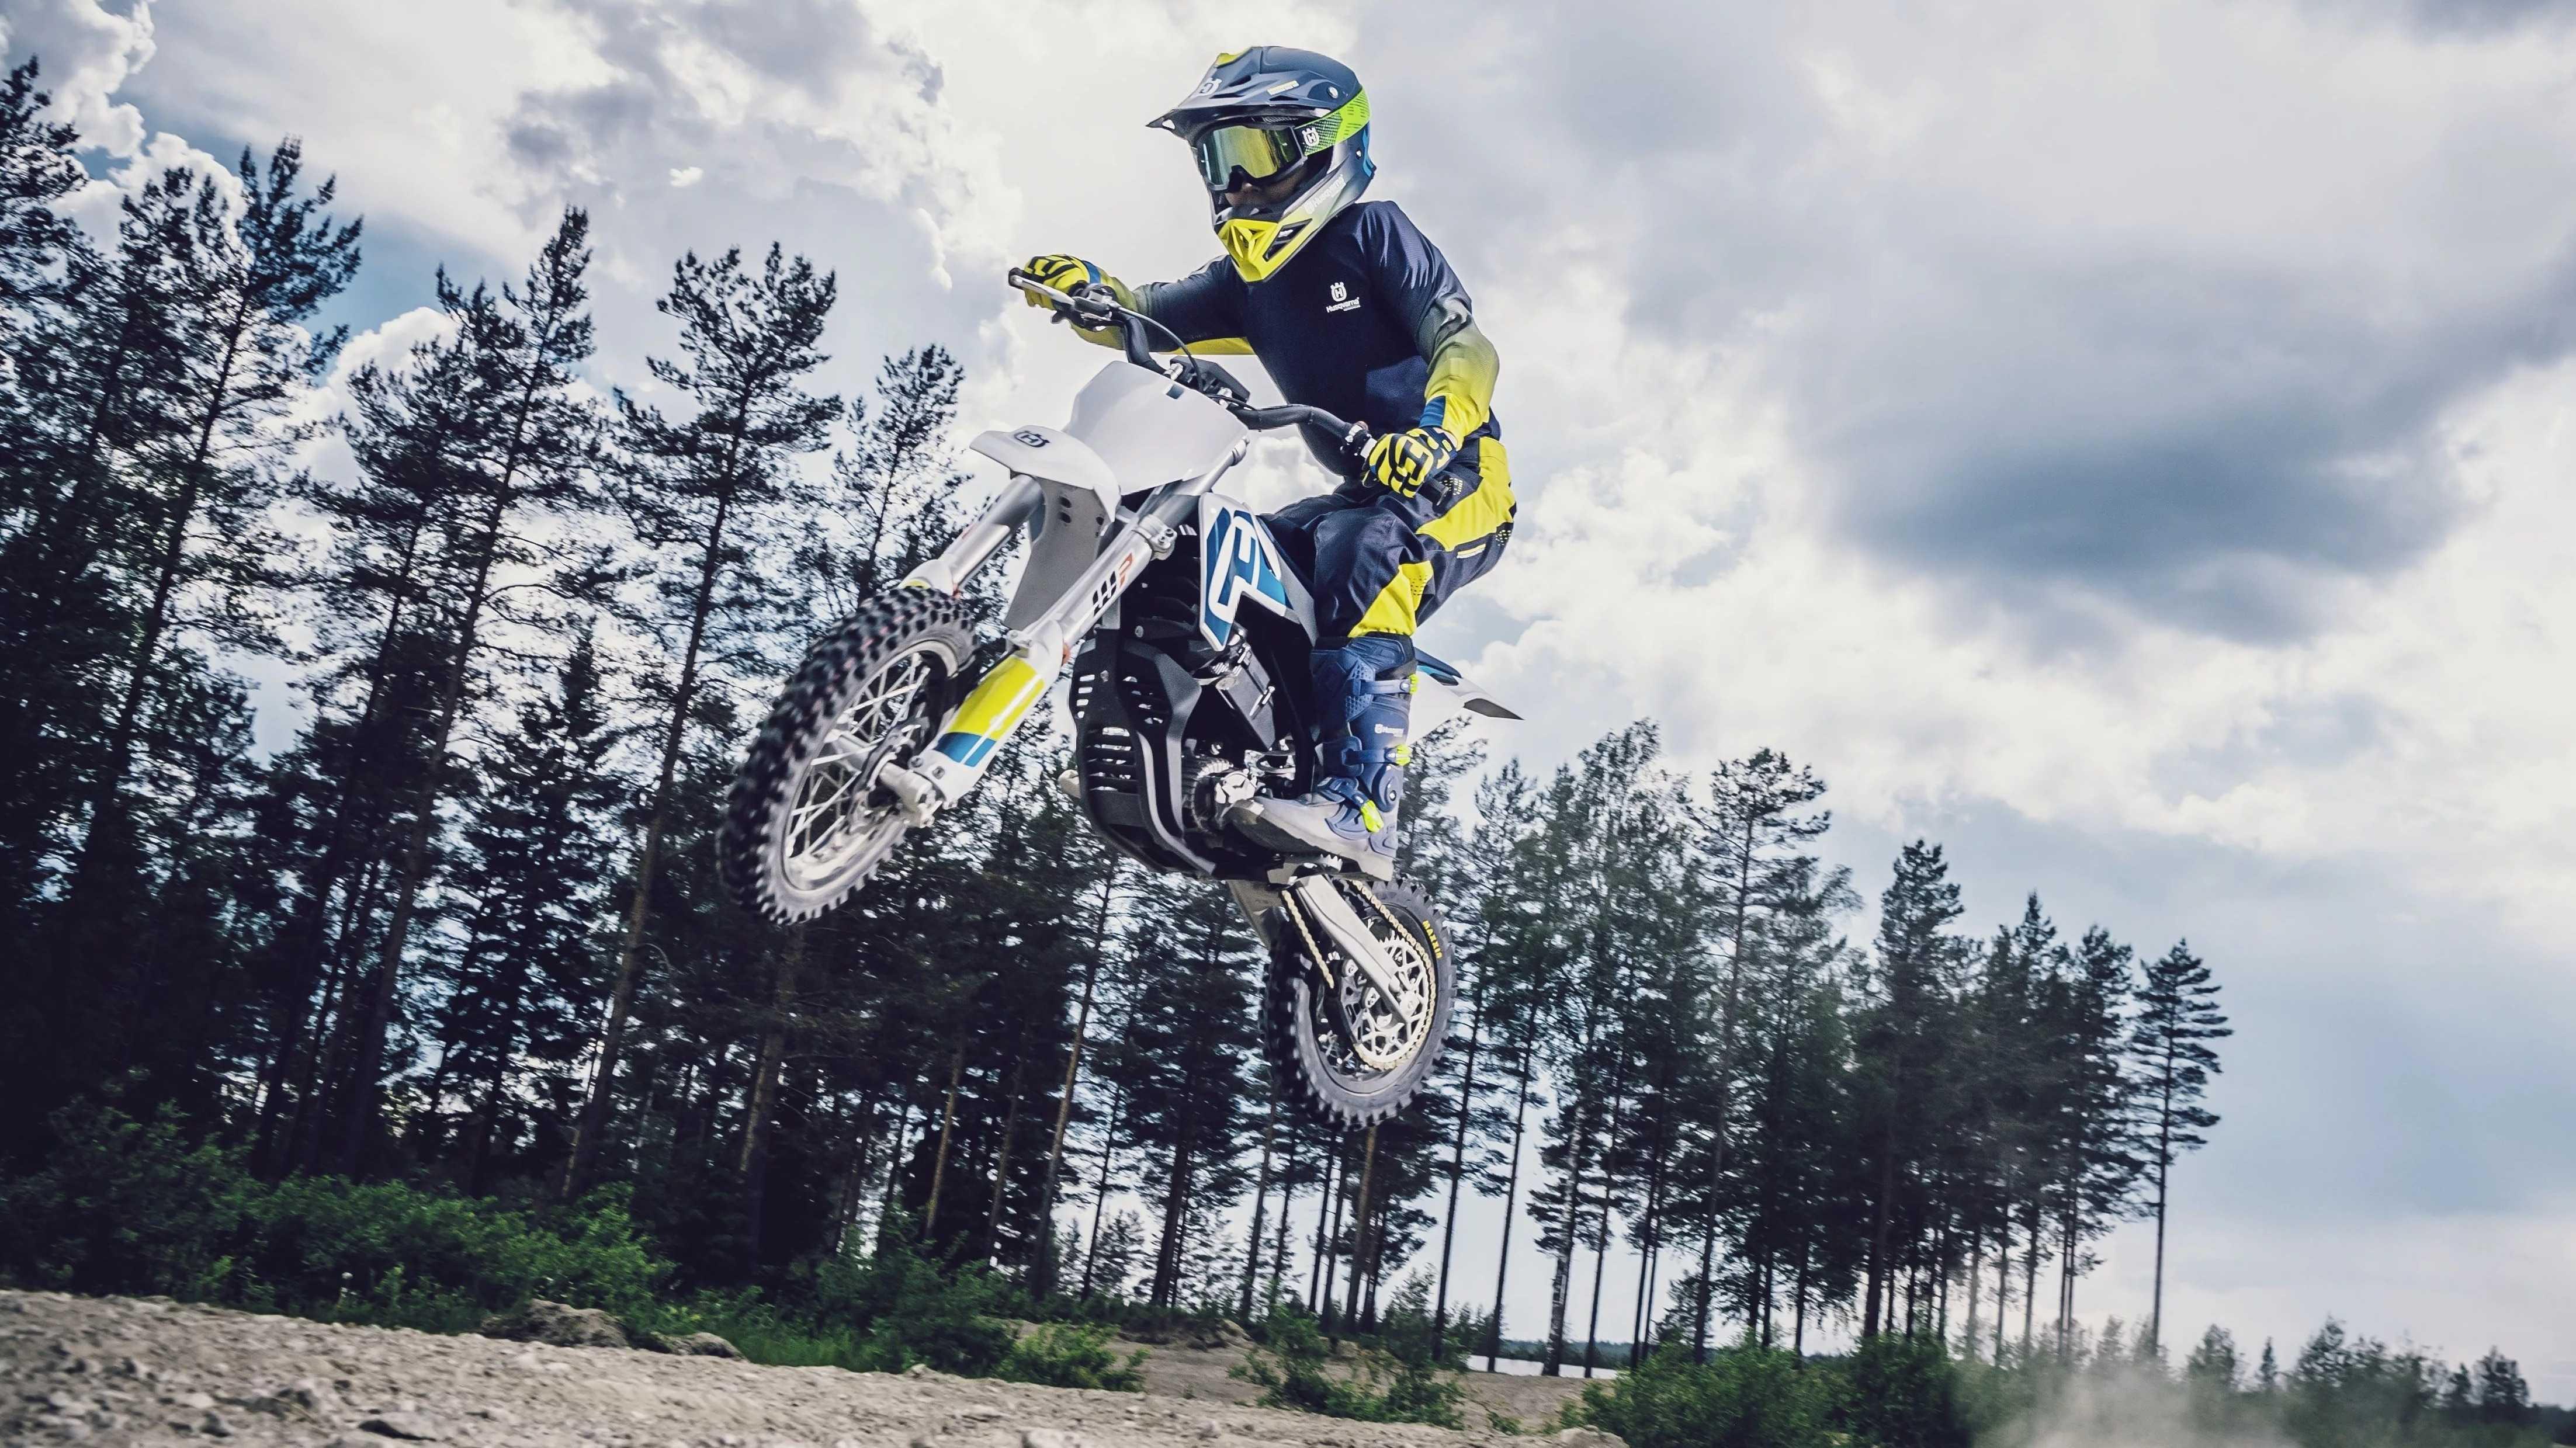 Elektro-Motorrad: Husqvarna bringt sein erstes elektrifiziertes Kleinmotorrad